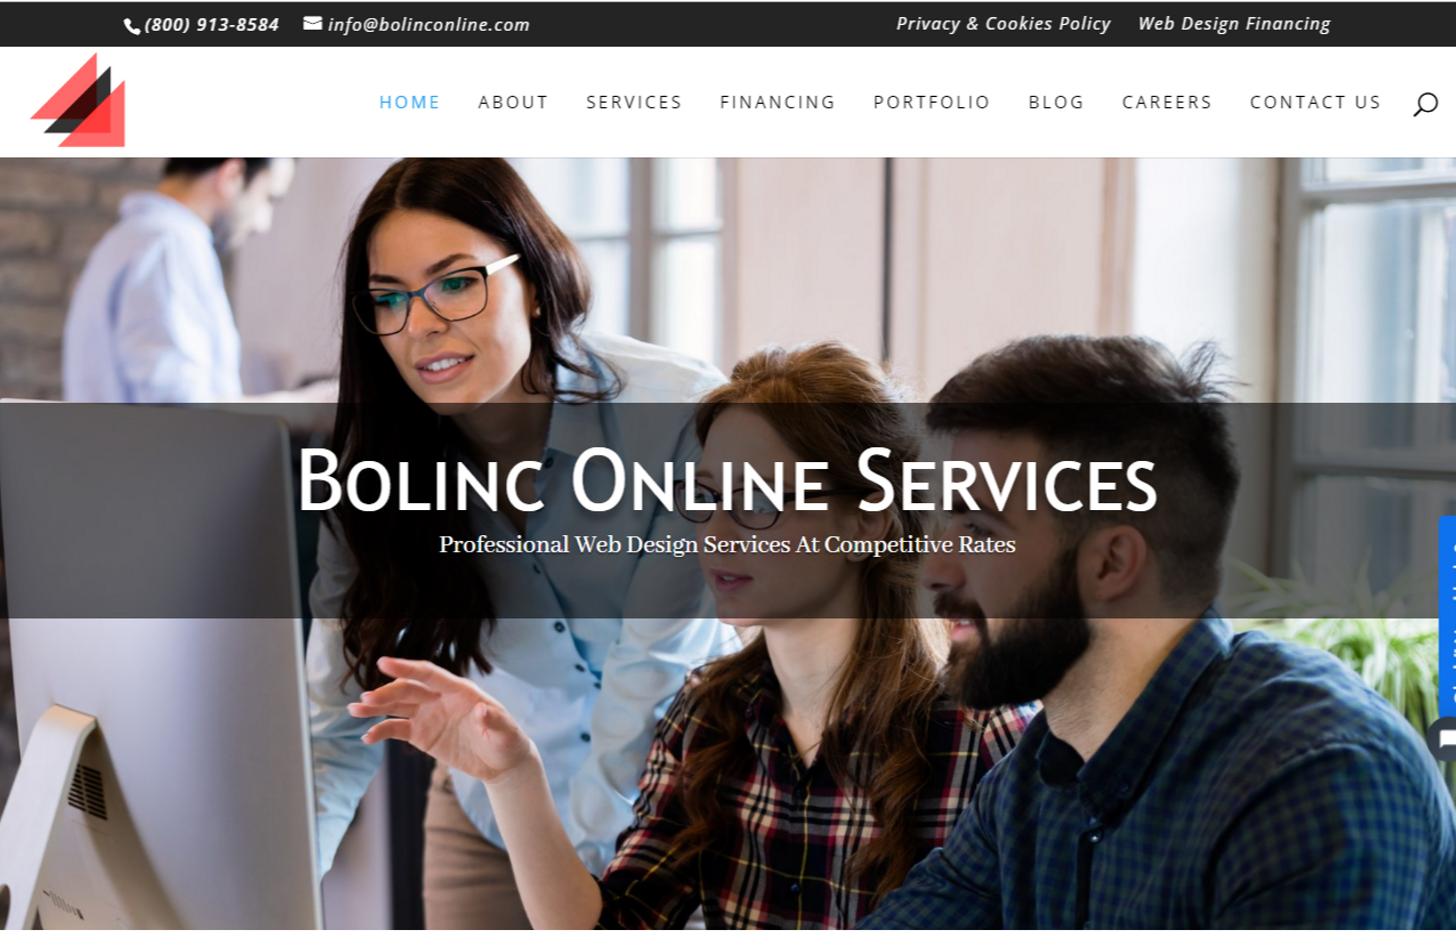 Bolinc Online